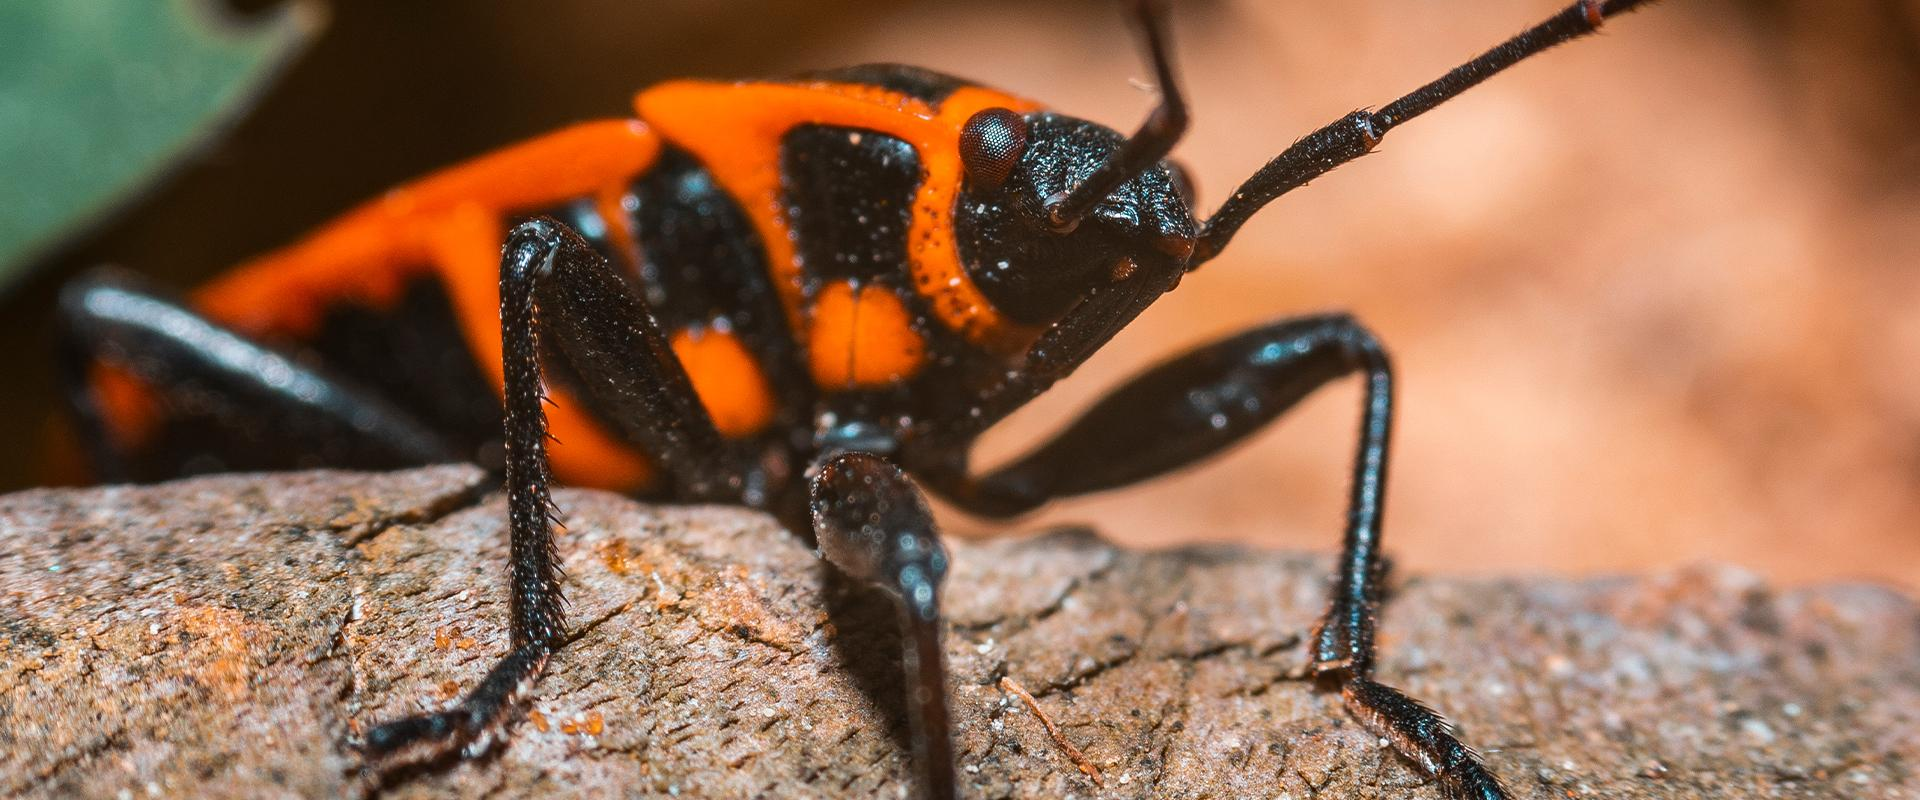 boxelder bug on a branch